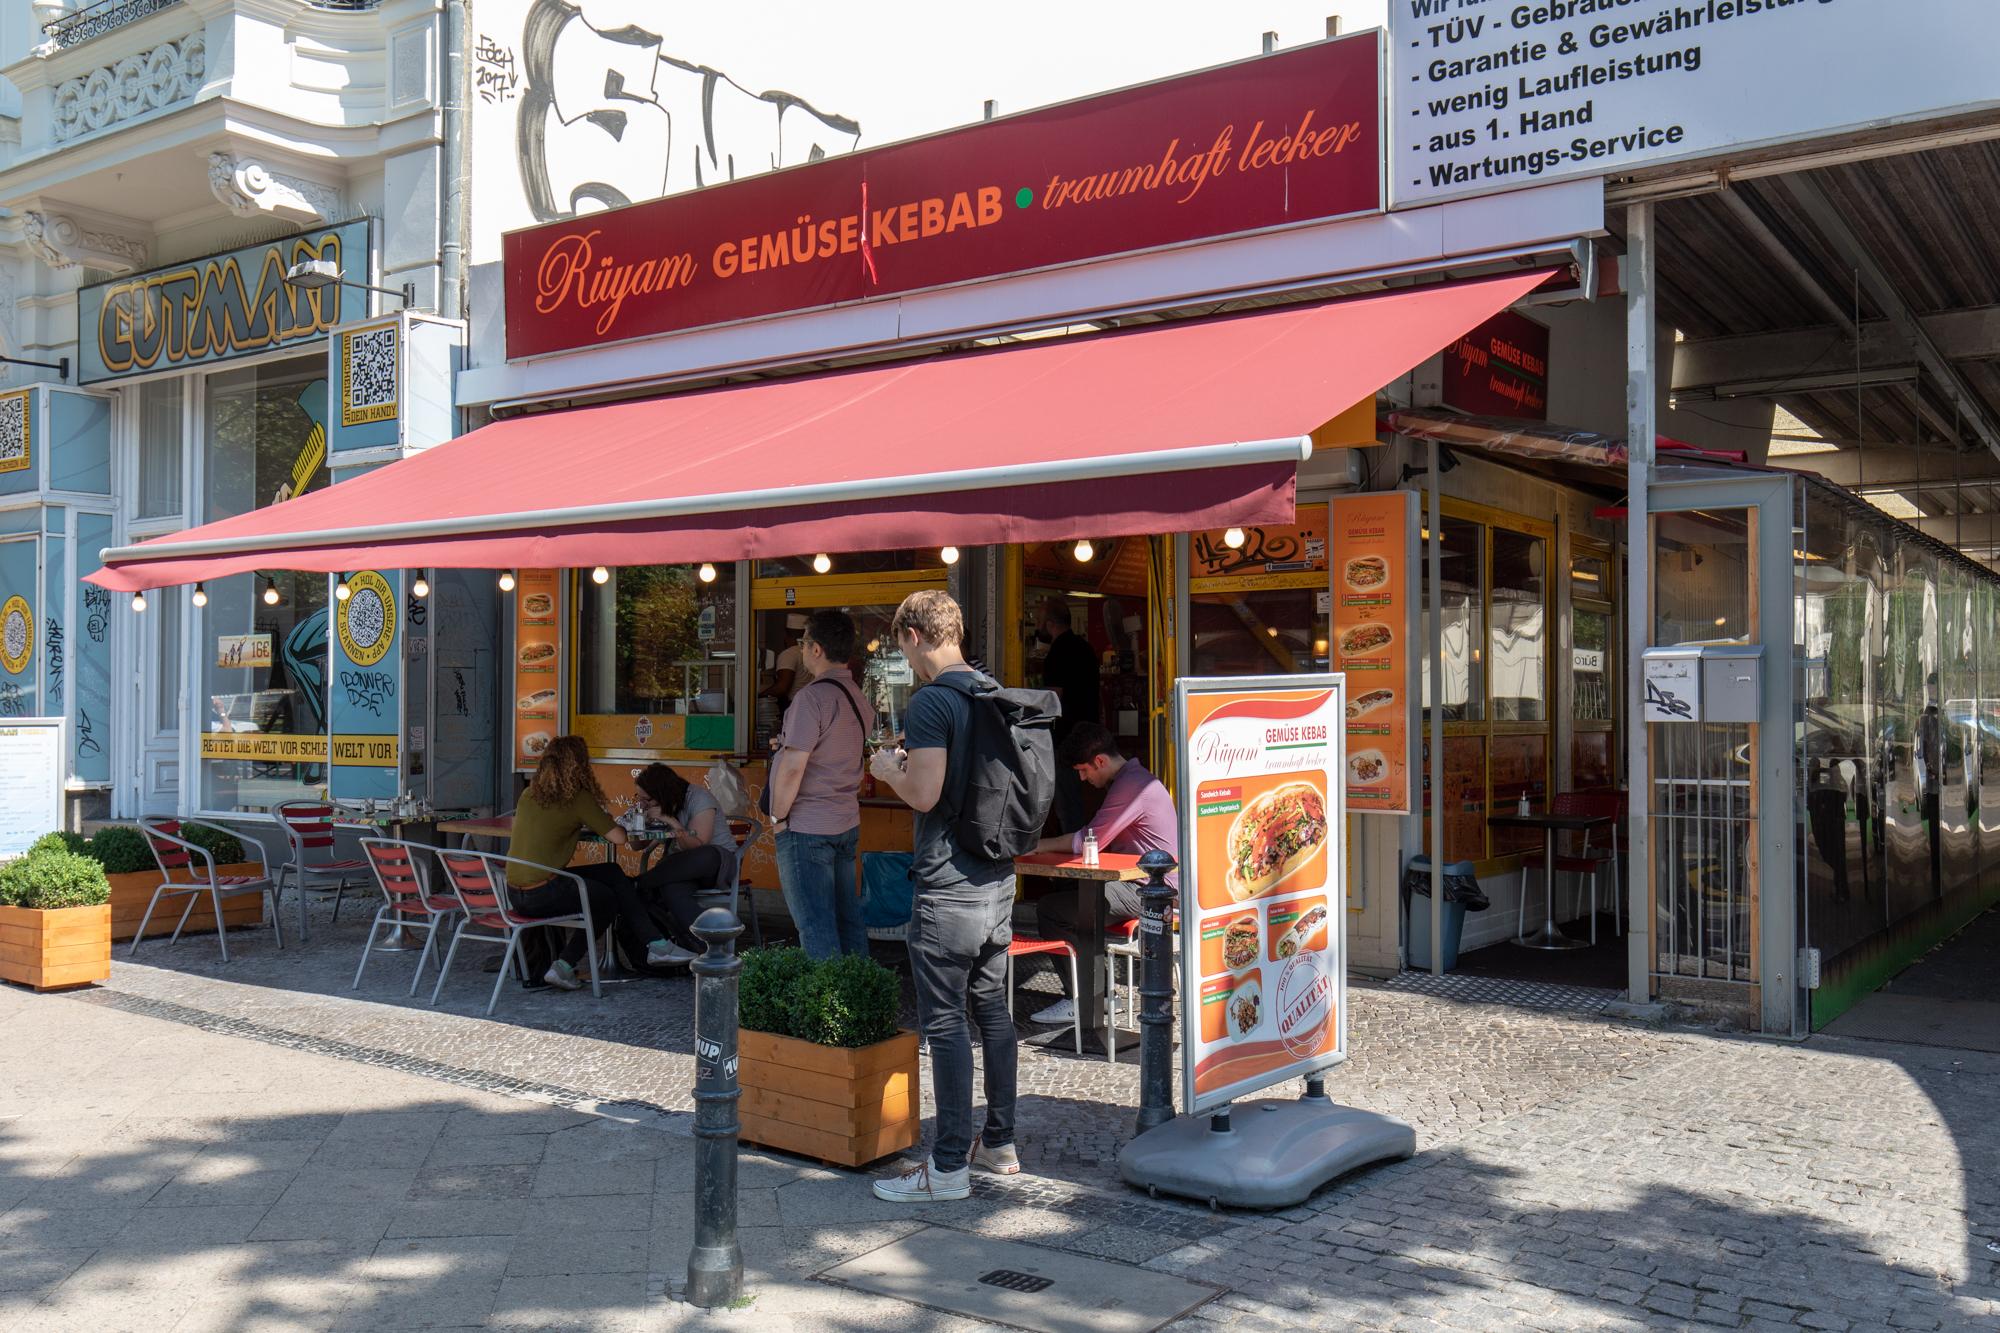 Rüyam Gemüse Kebab Berlin - Mein Traum Kebab - Berlin Love